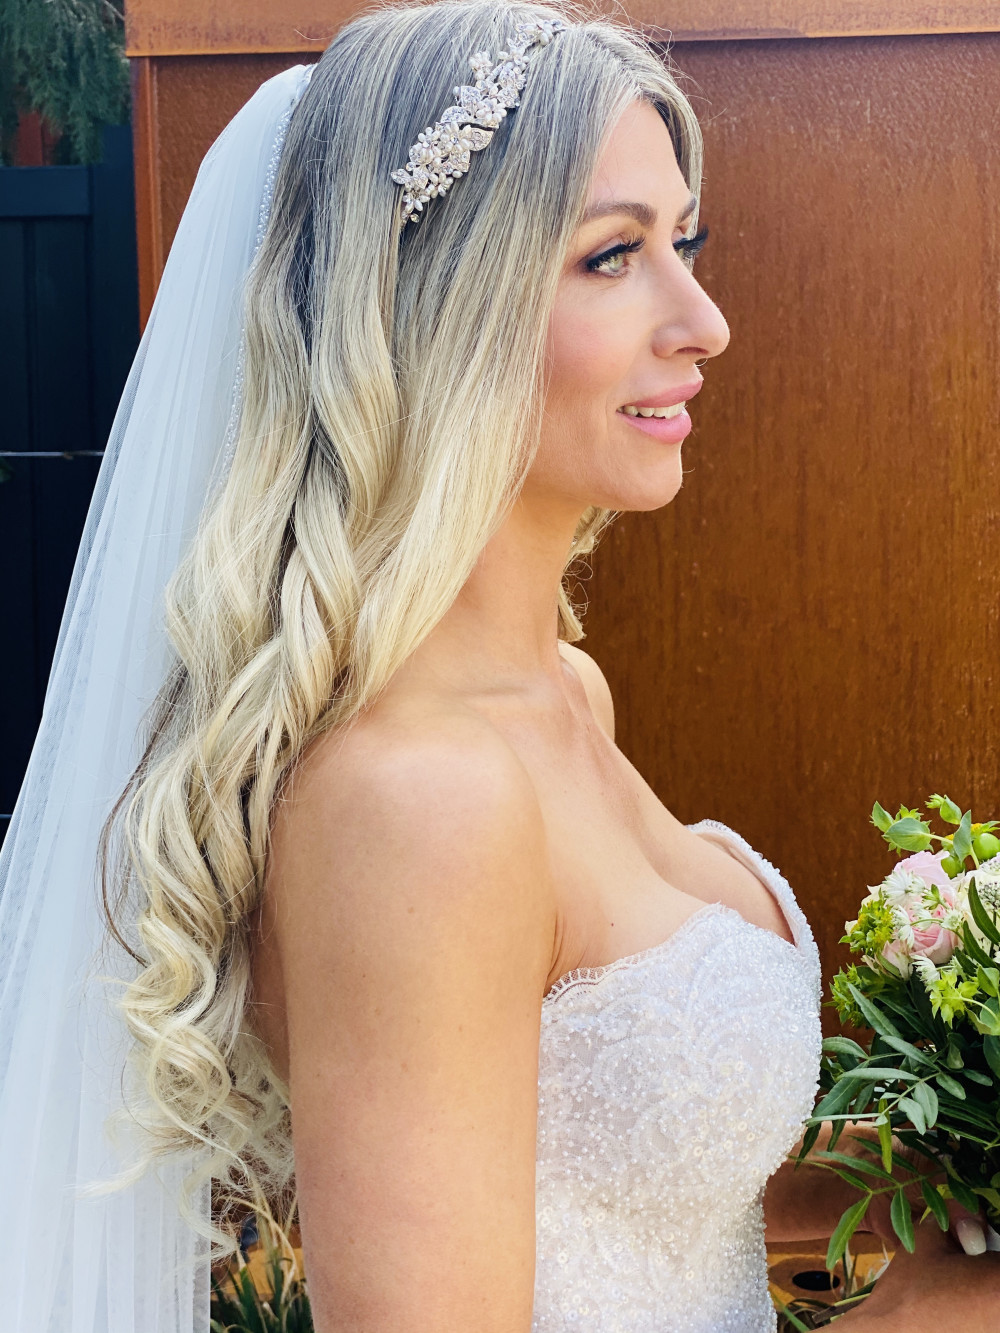 Curly hair and beautiful makeup - Make Me Bridal Artist: RLM wedding makeup. Photography by: Rebecca Louise Middleton. #glamorous #naturalmakeup #curls #blonde #bridalmakeup